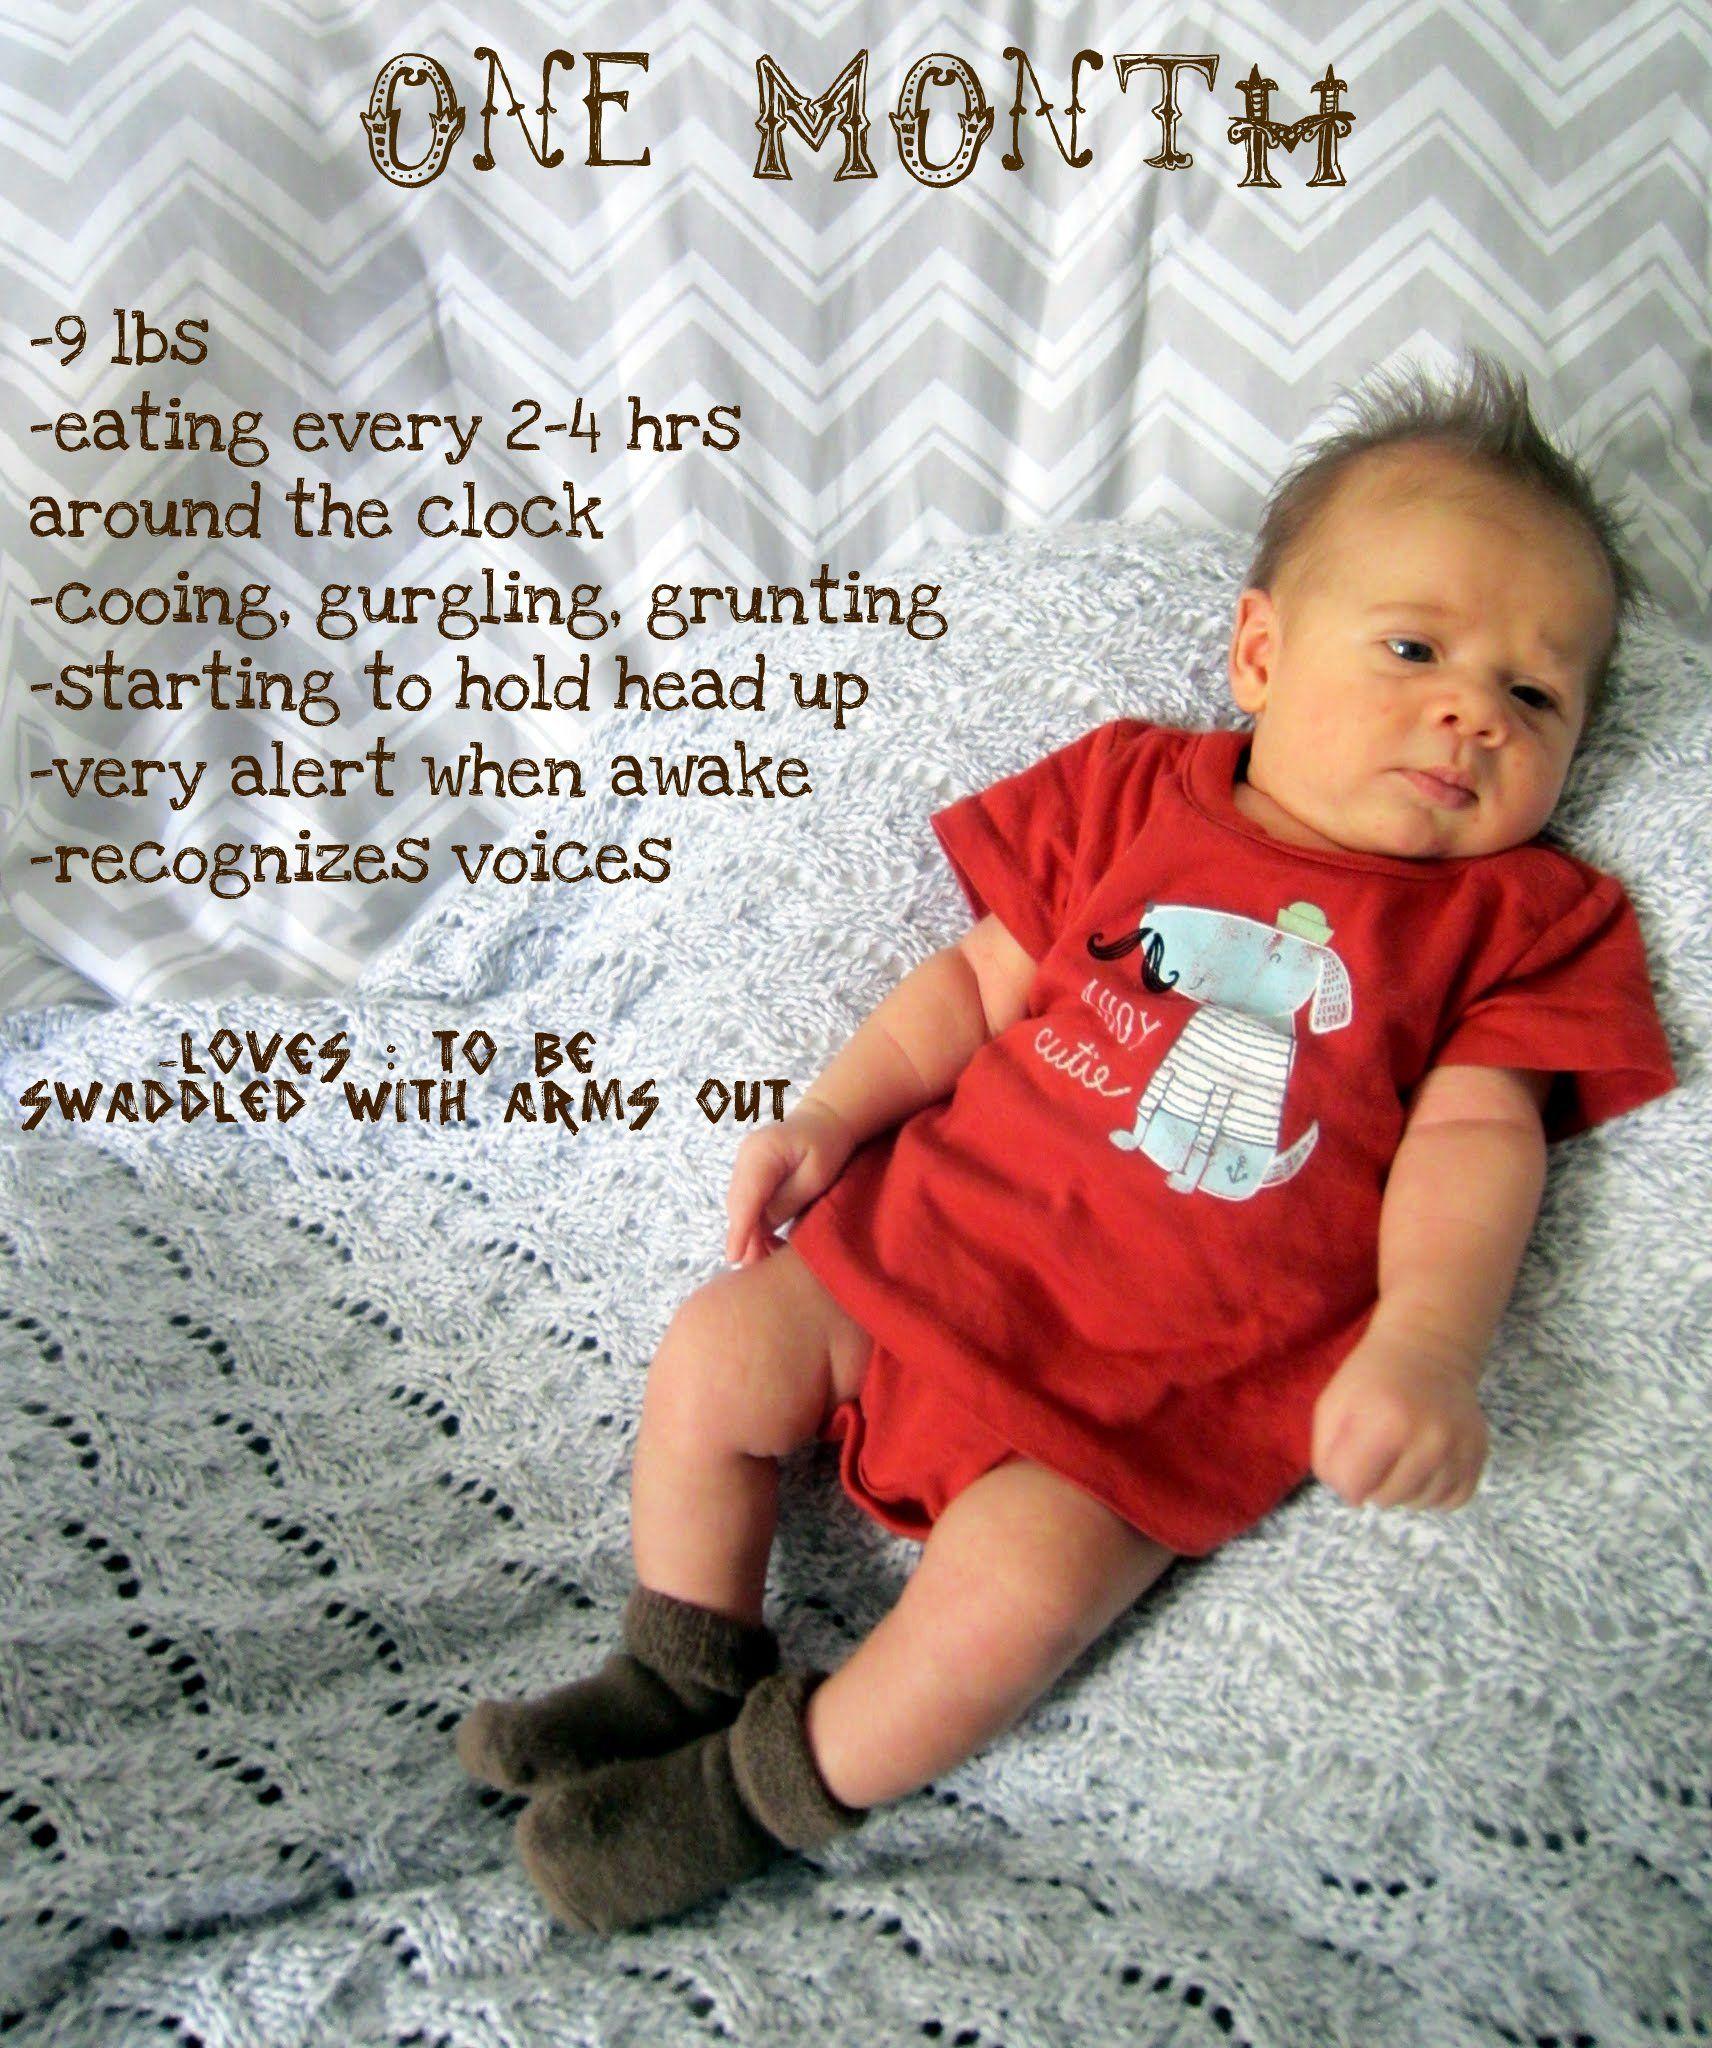 Scrapbook ideas baby milestones - One Month Old Baby Update